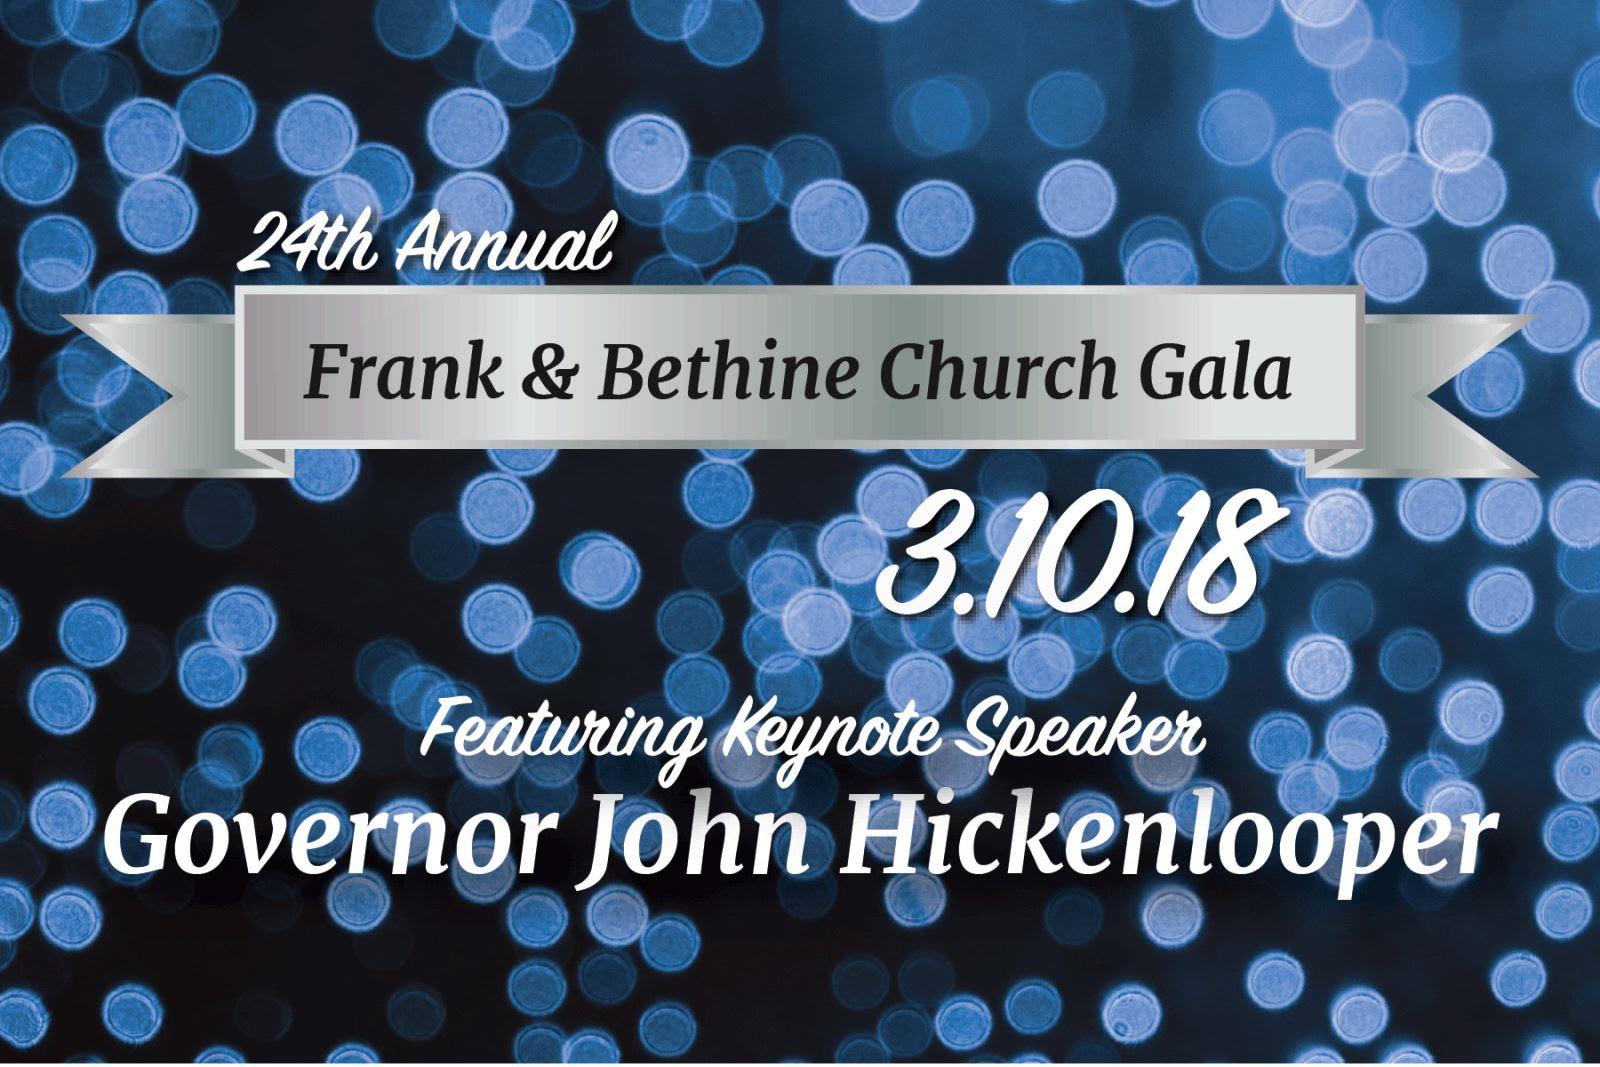 Frank & Bethine Church Gala Banner